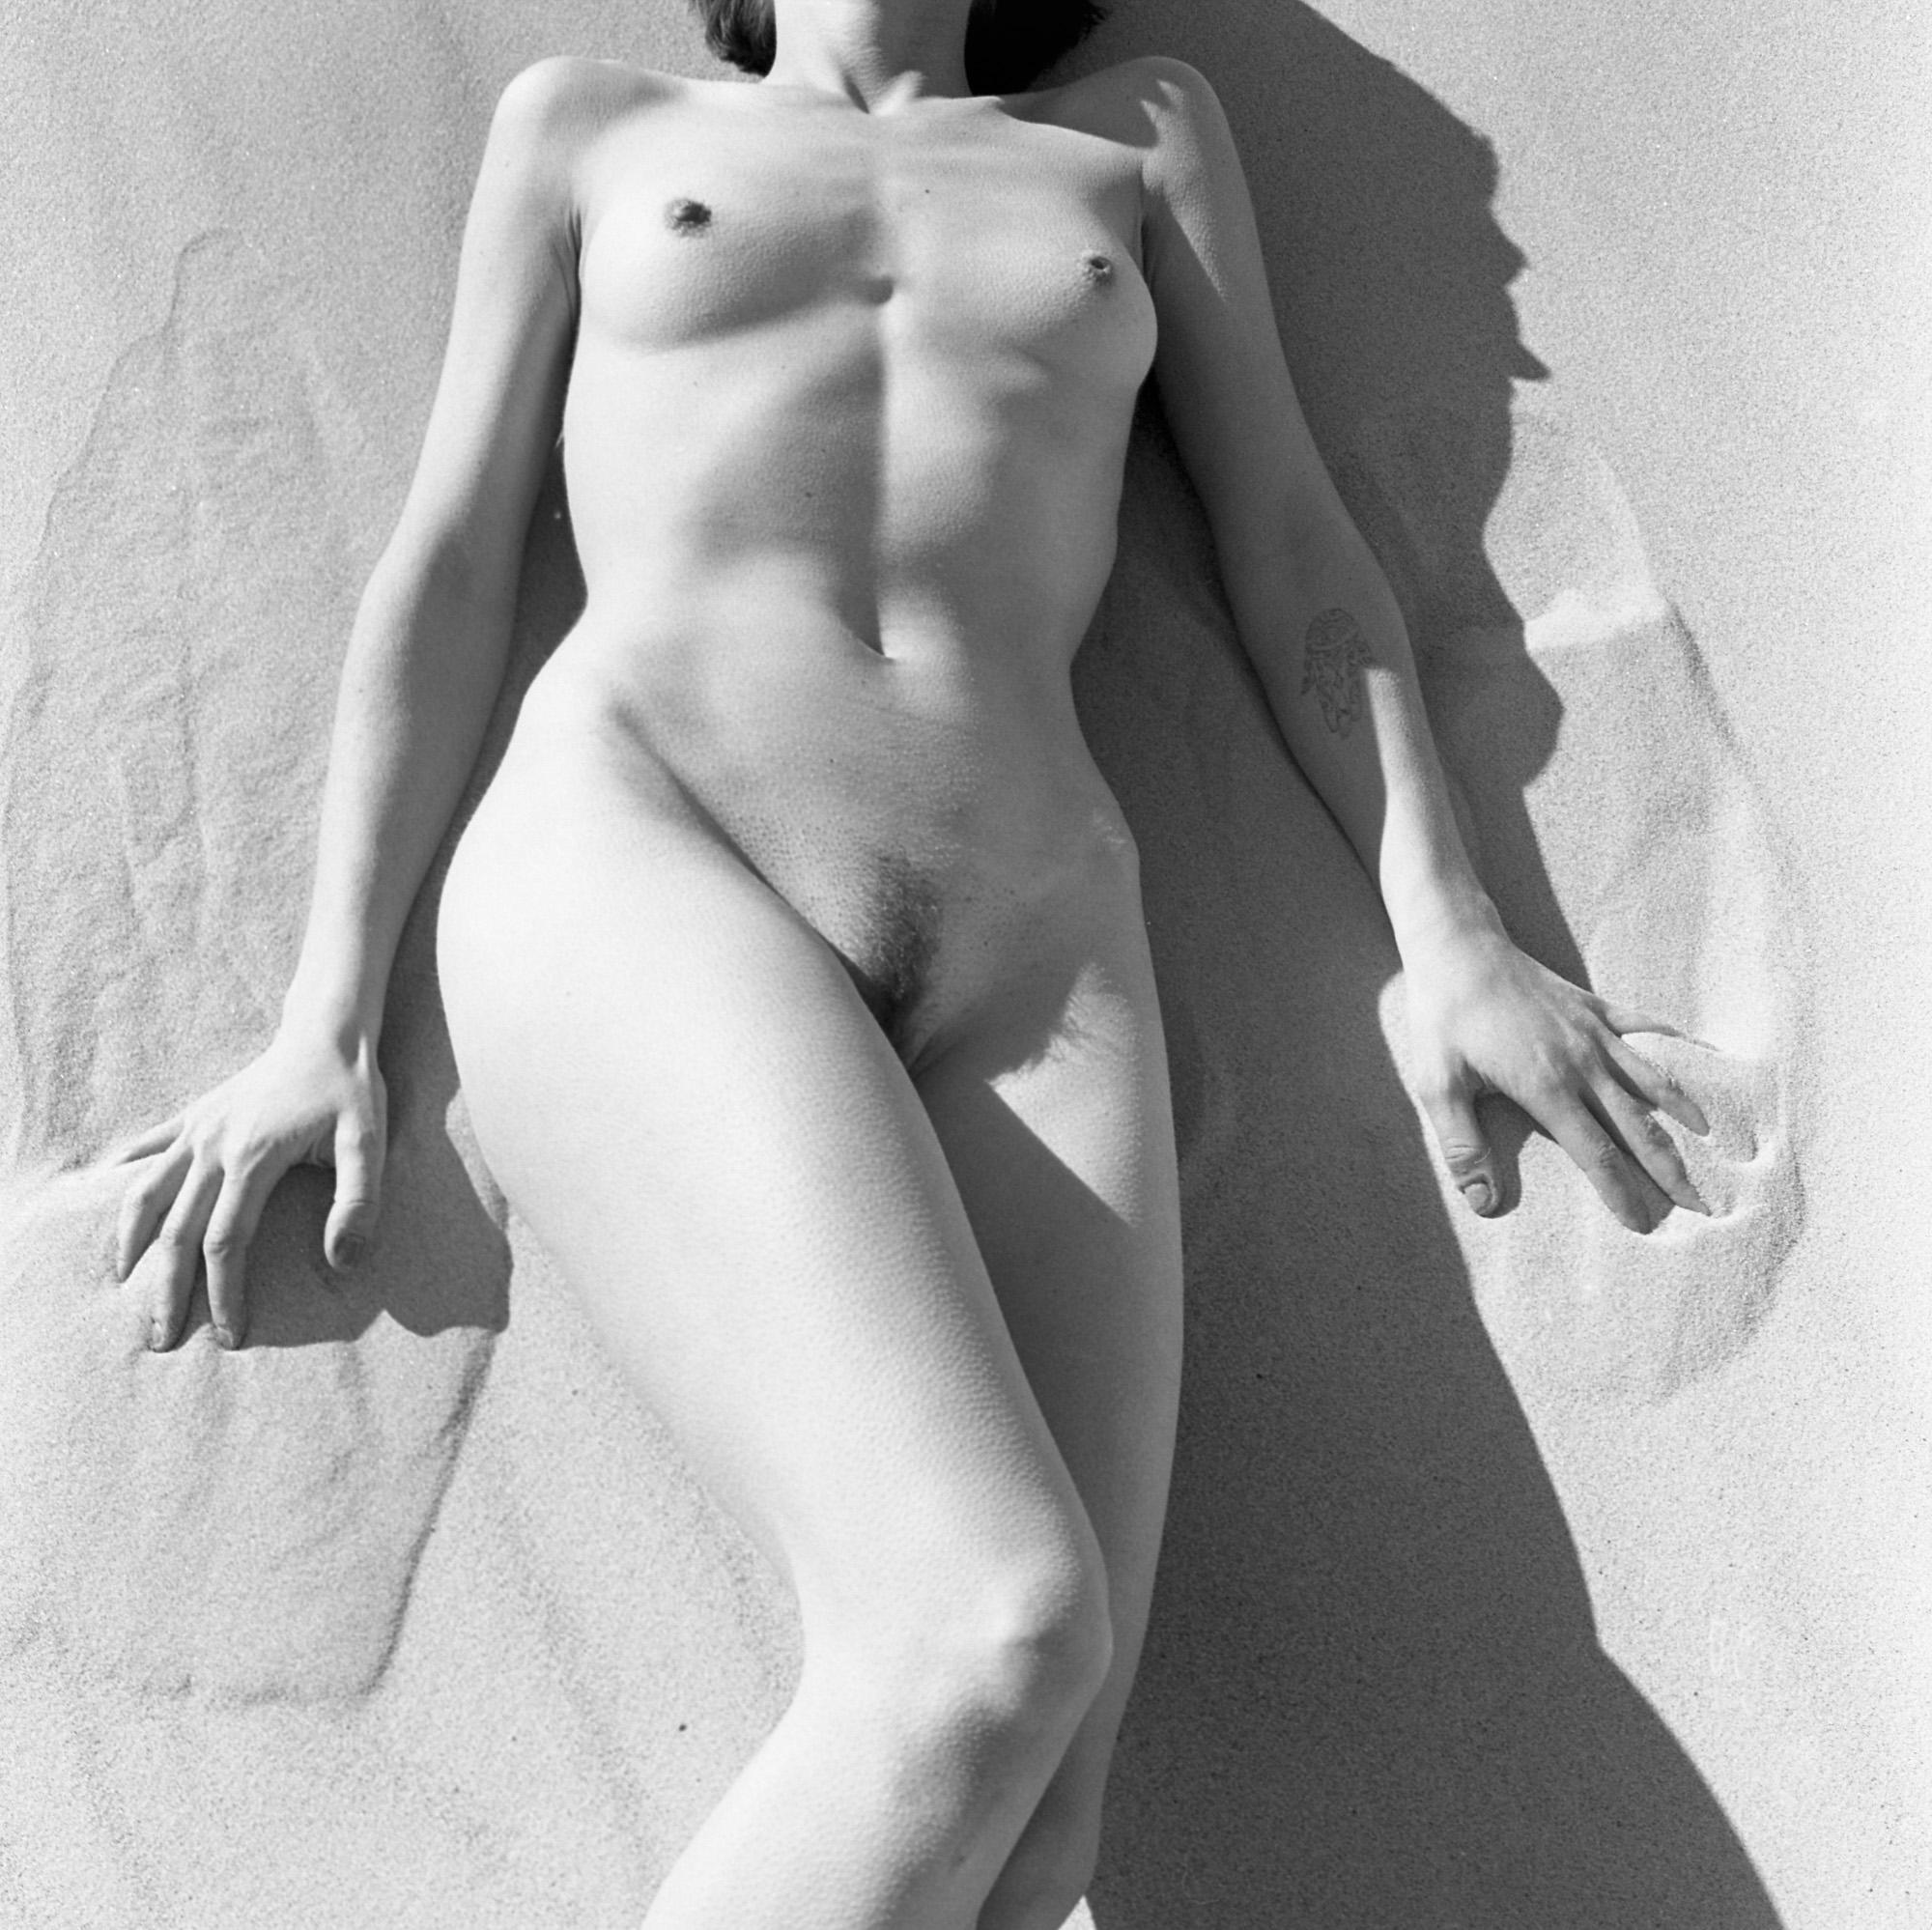 Henrikson Archive Nudes web_24.jpg